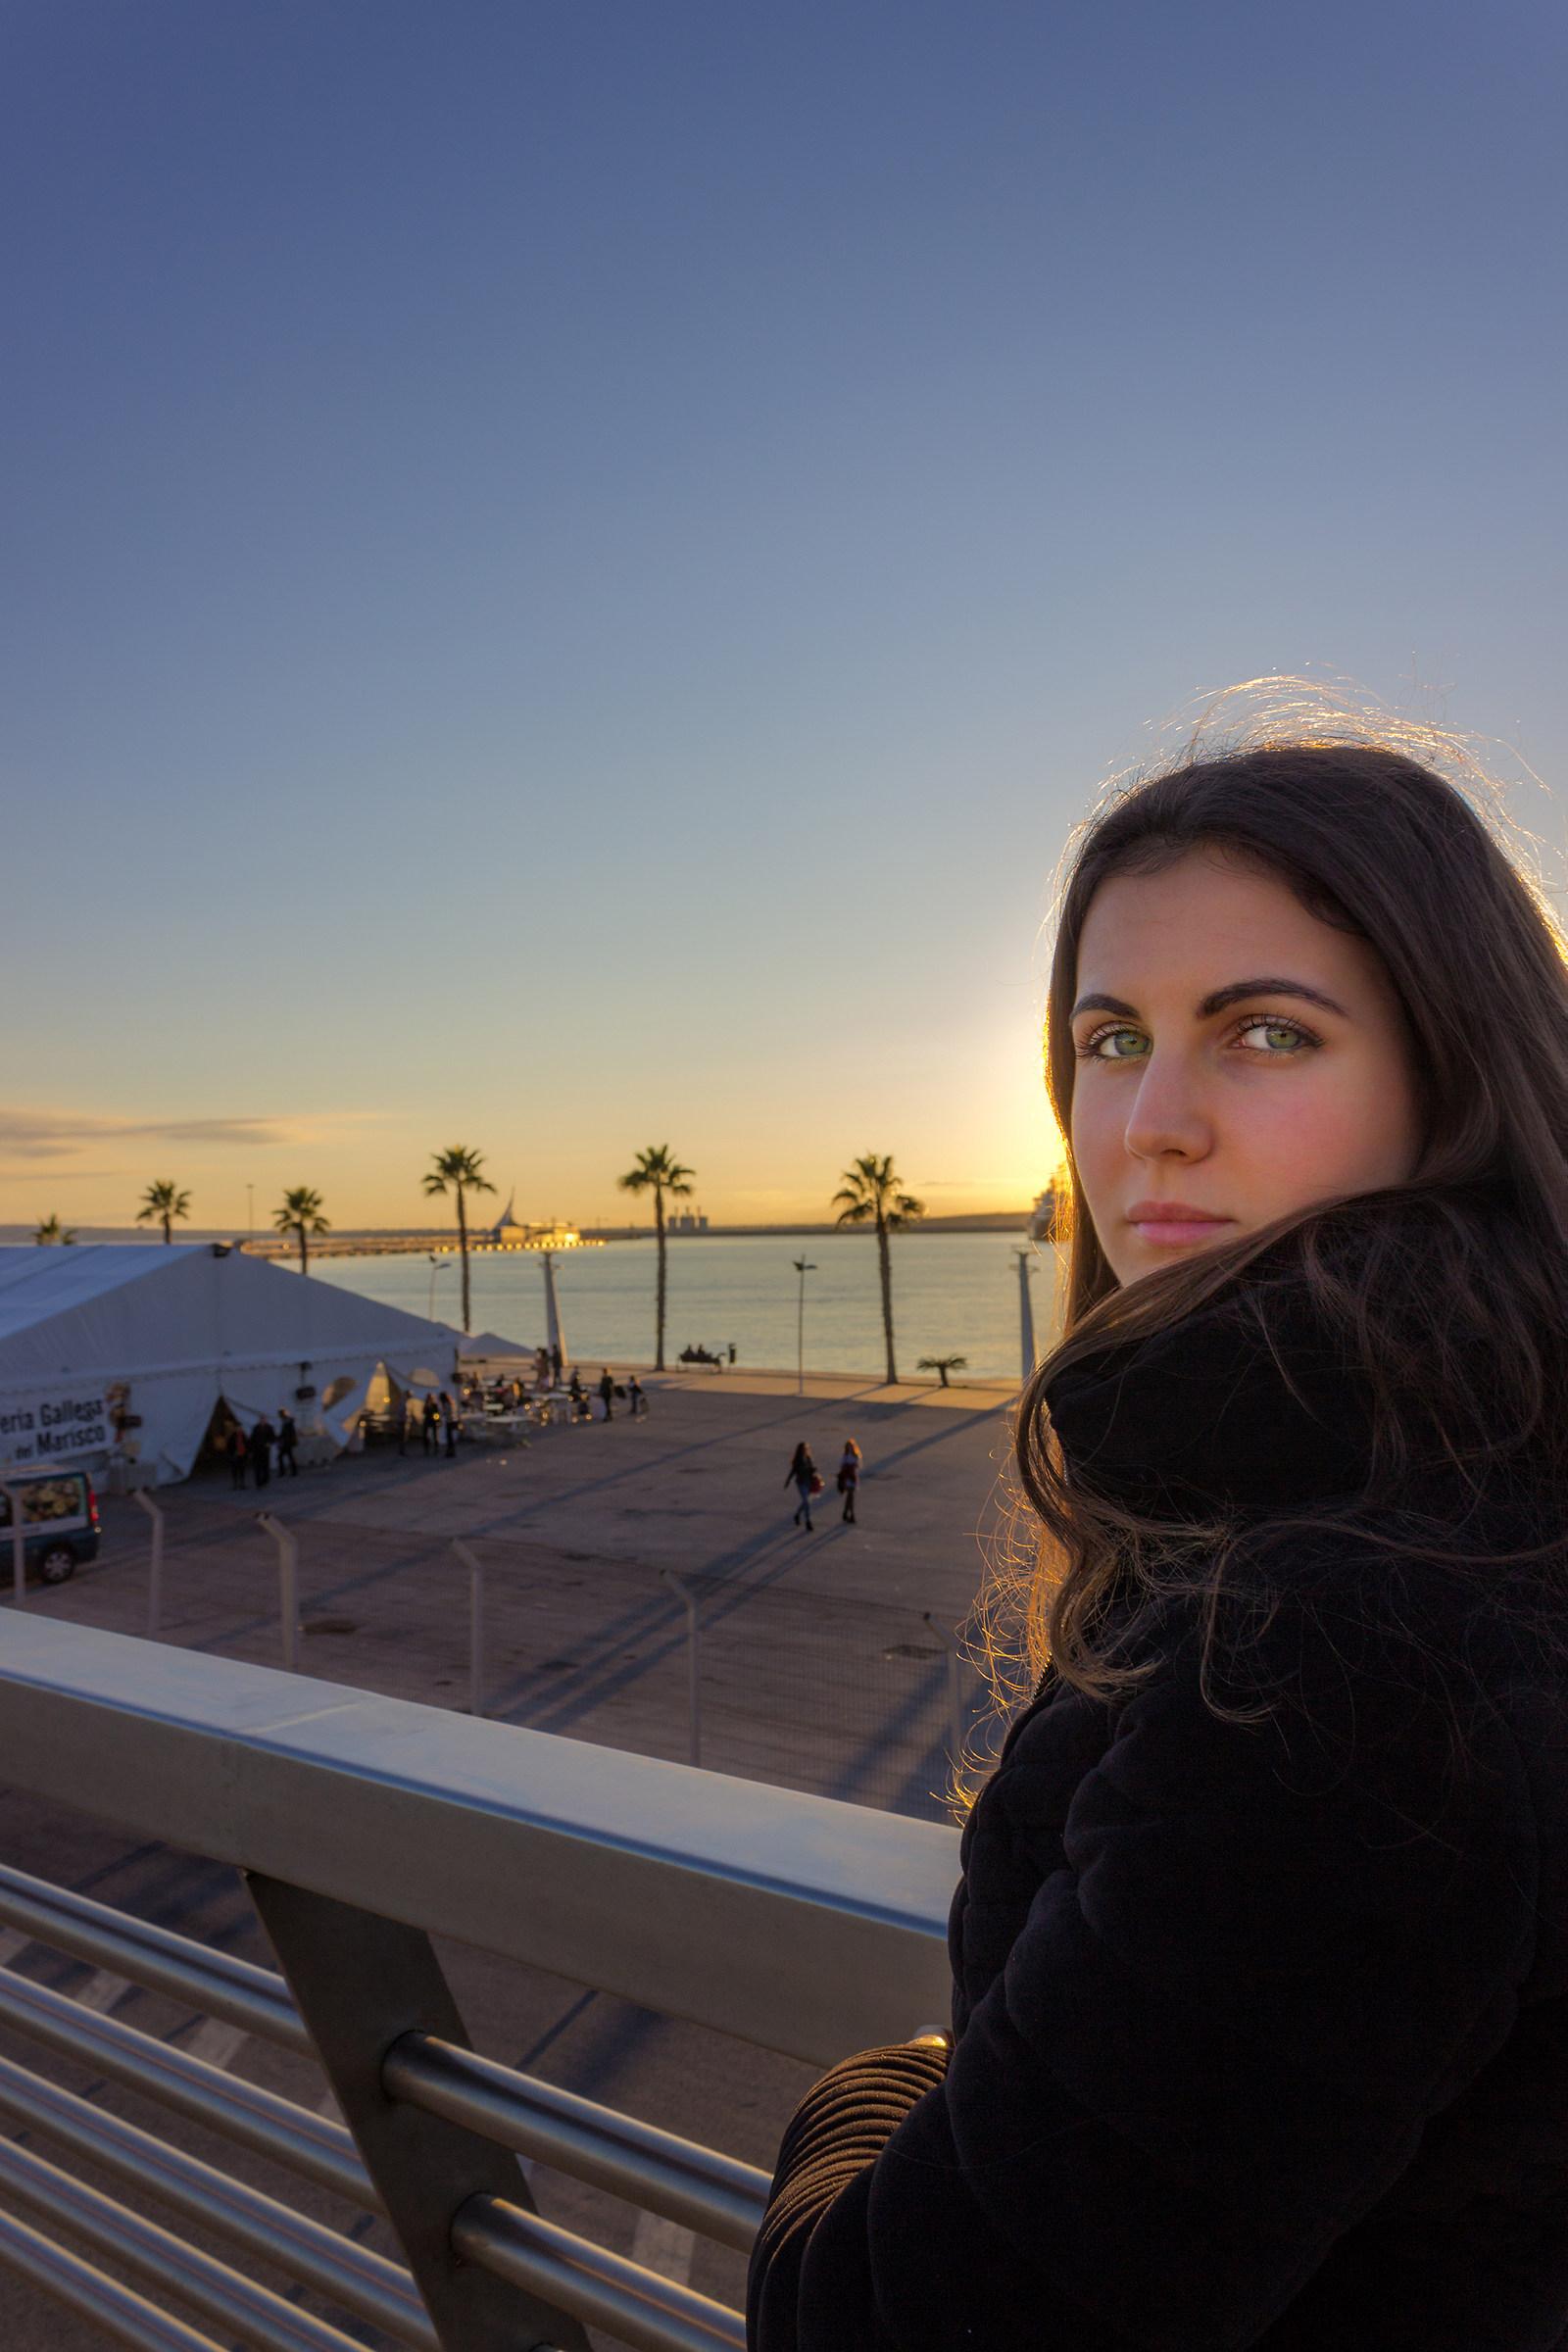 Emerald eyes at sunset...